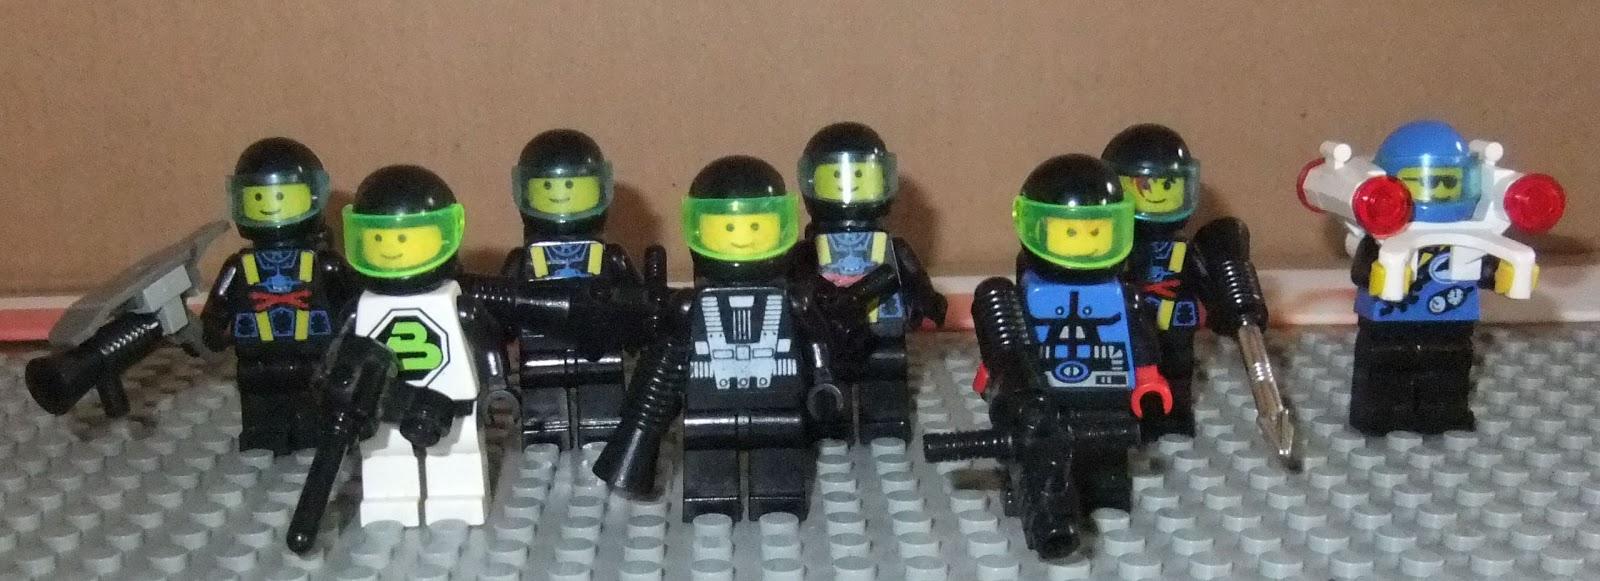 Alles Lego Muss Raus